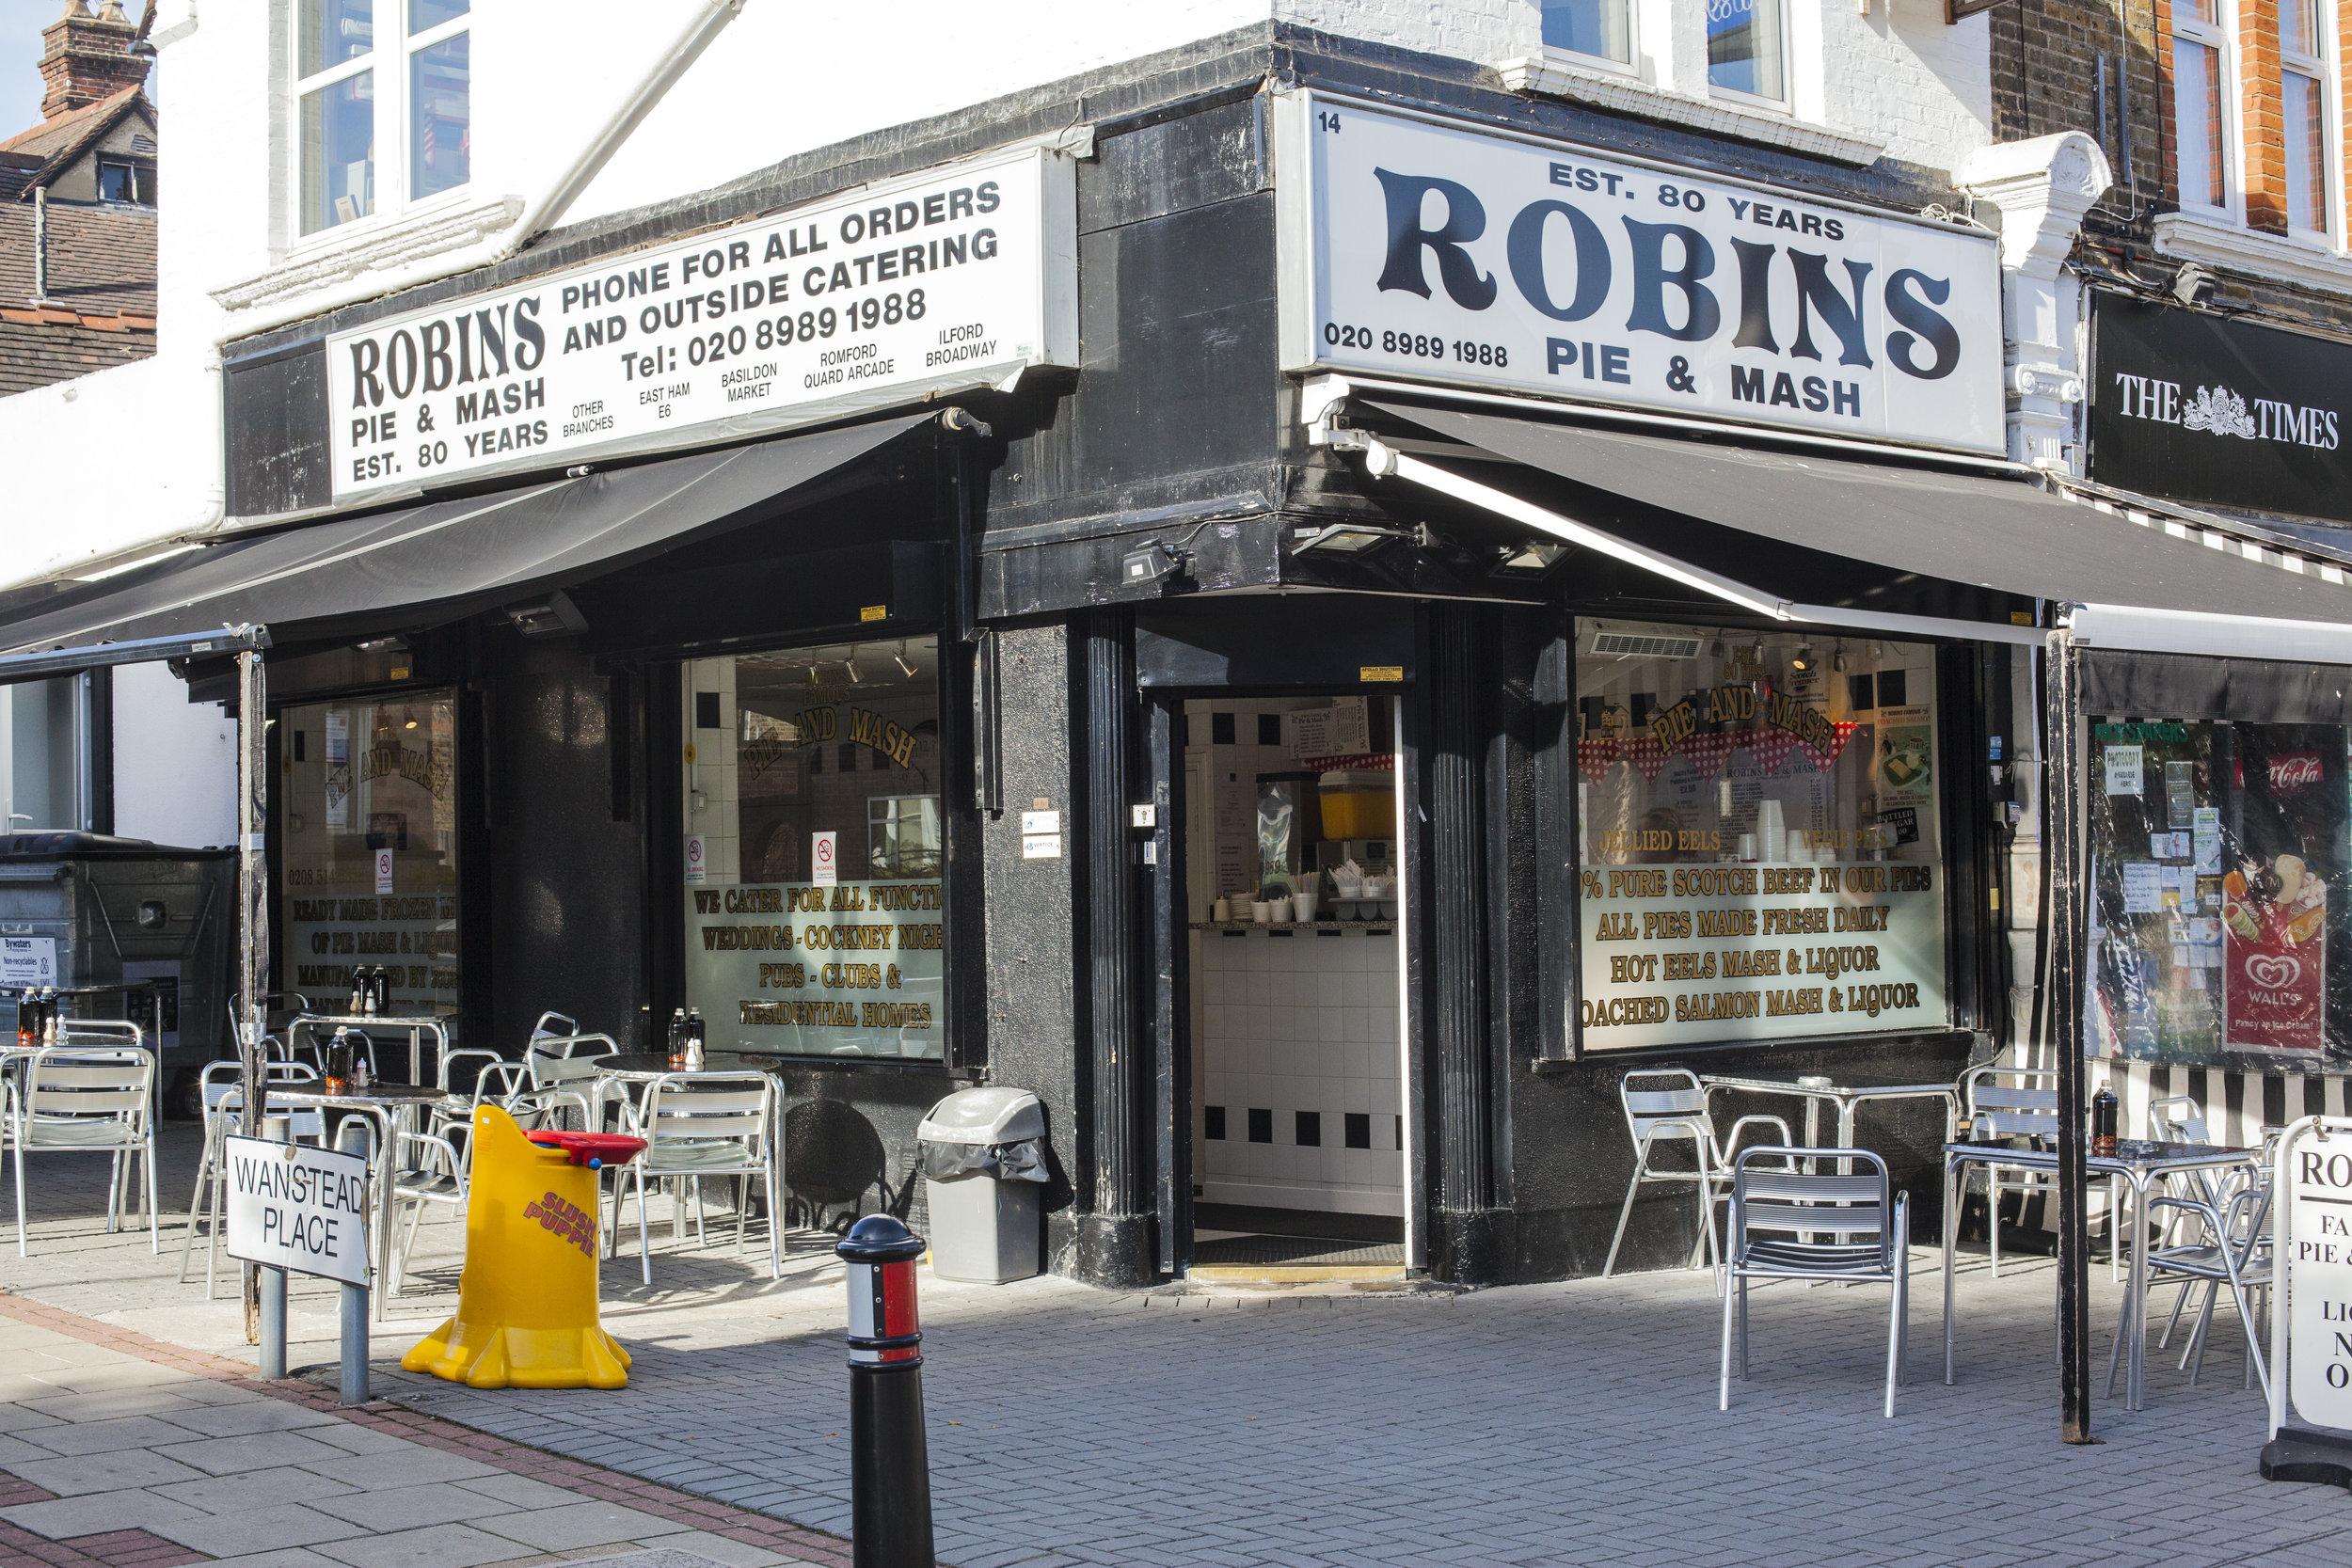 ROBINS_WANSTEAD_1.jpg